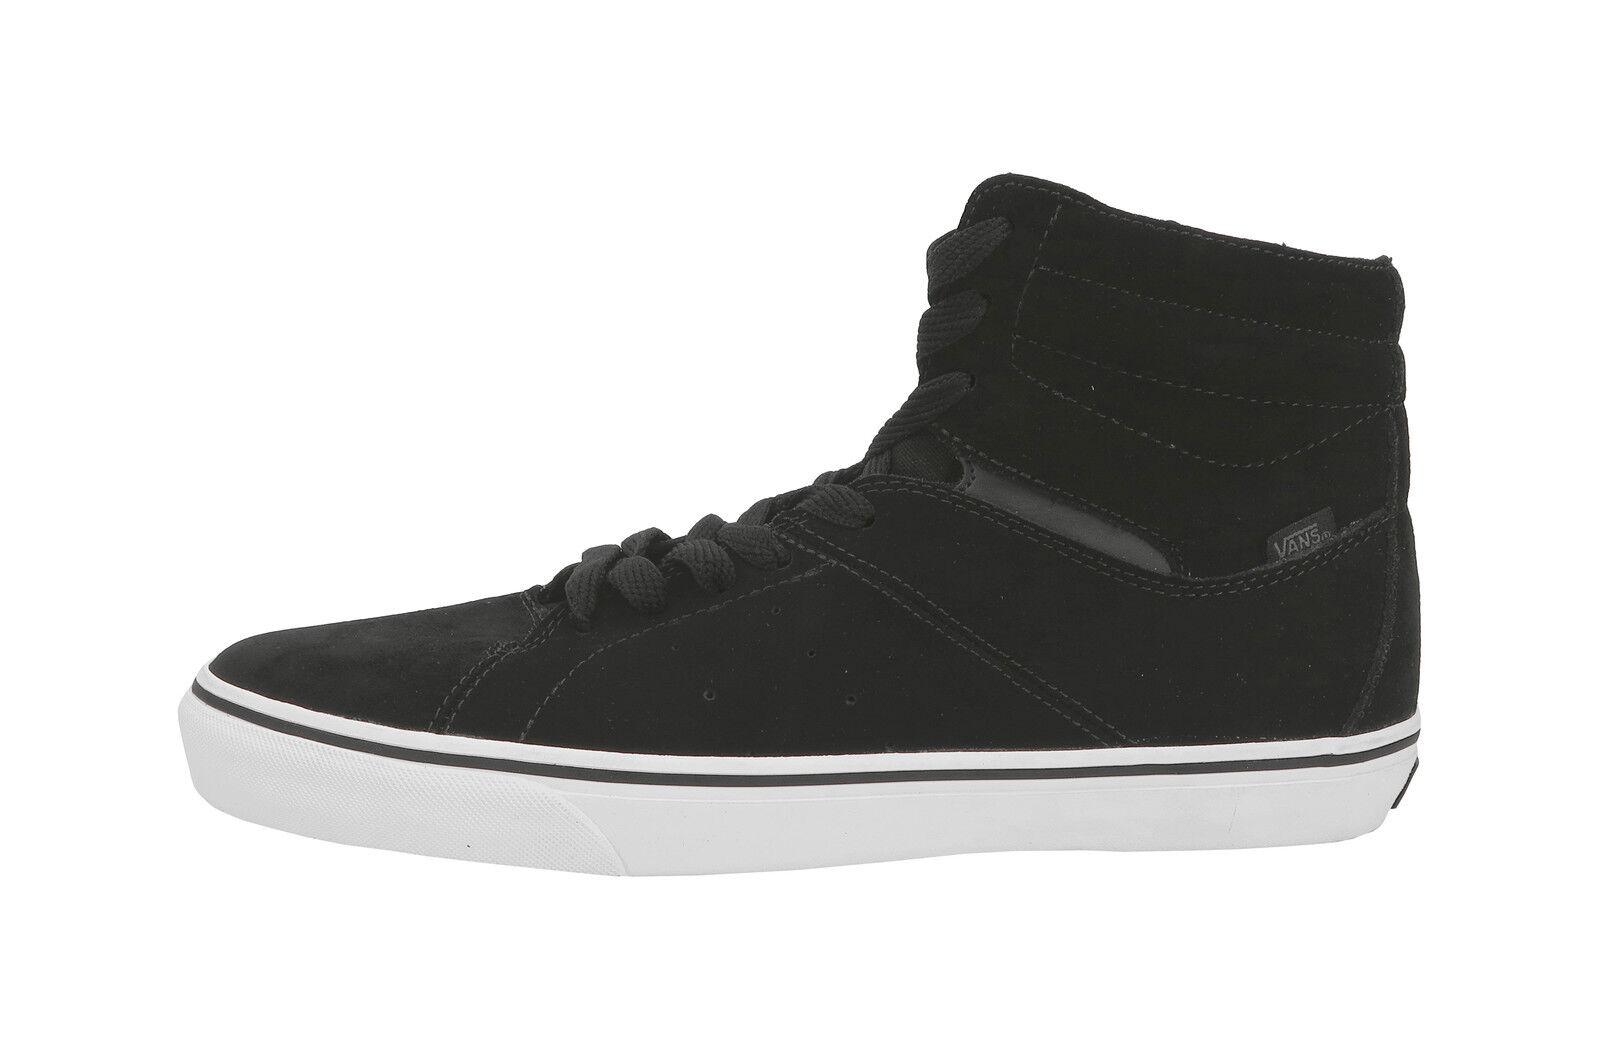 Vans Paladin Suede Black White High Top Shoes Skateboarding Sneakers